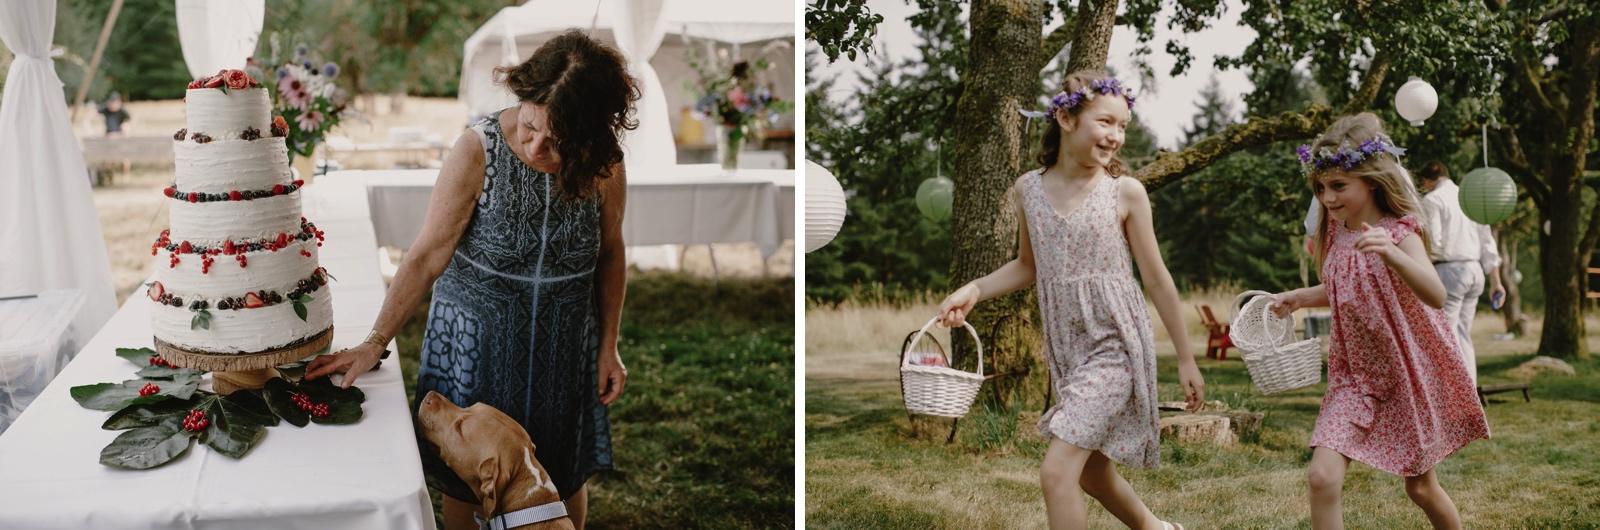 Backyard_Vashon_Island_Wedding_Kristen_Marie_Parker057.JPG